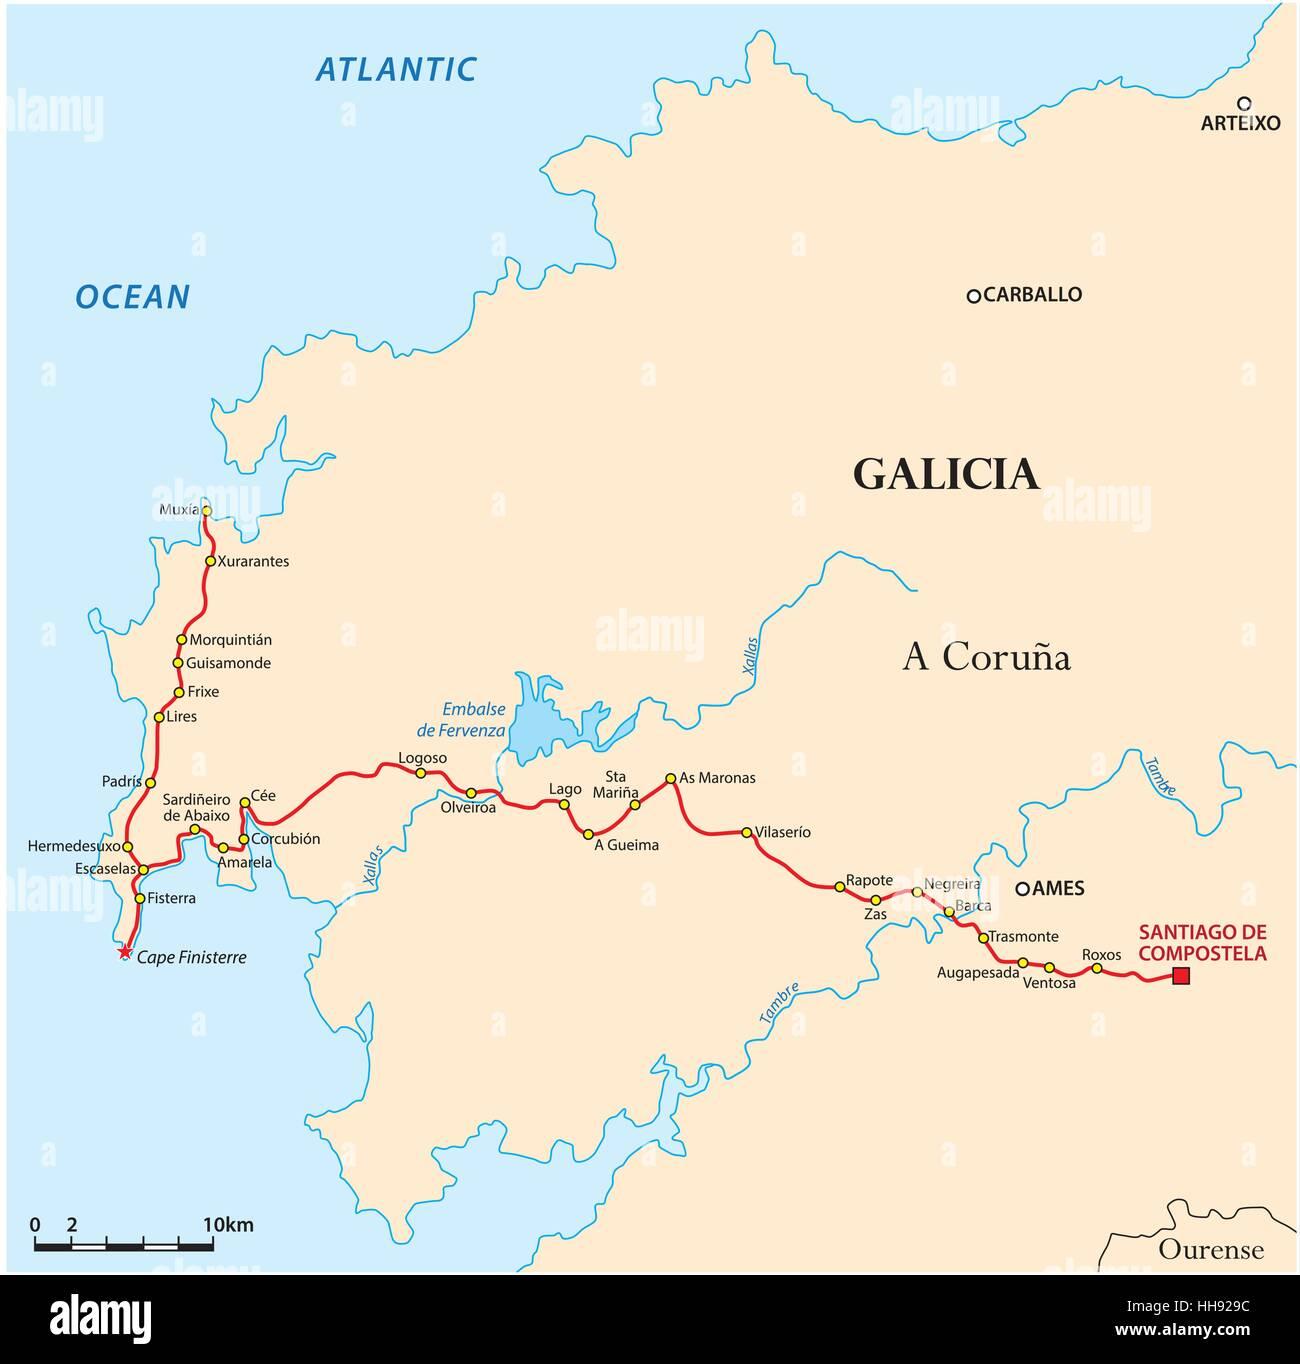 Jakobsweg Spanien Karte.Karte Jakobsweg Nach Santiago De Compostela Zum Kap Finisterre